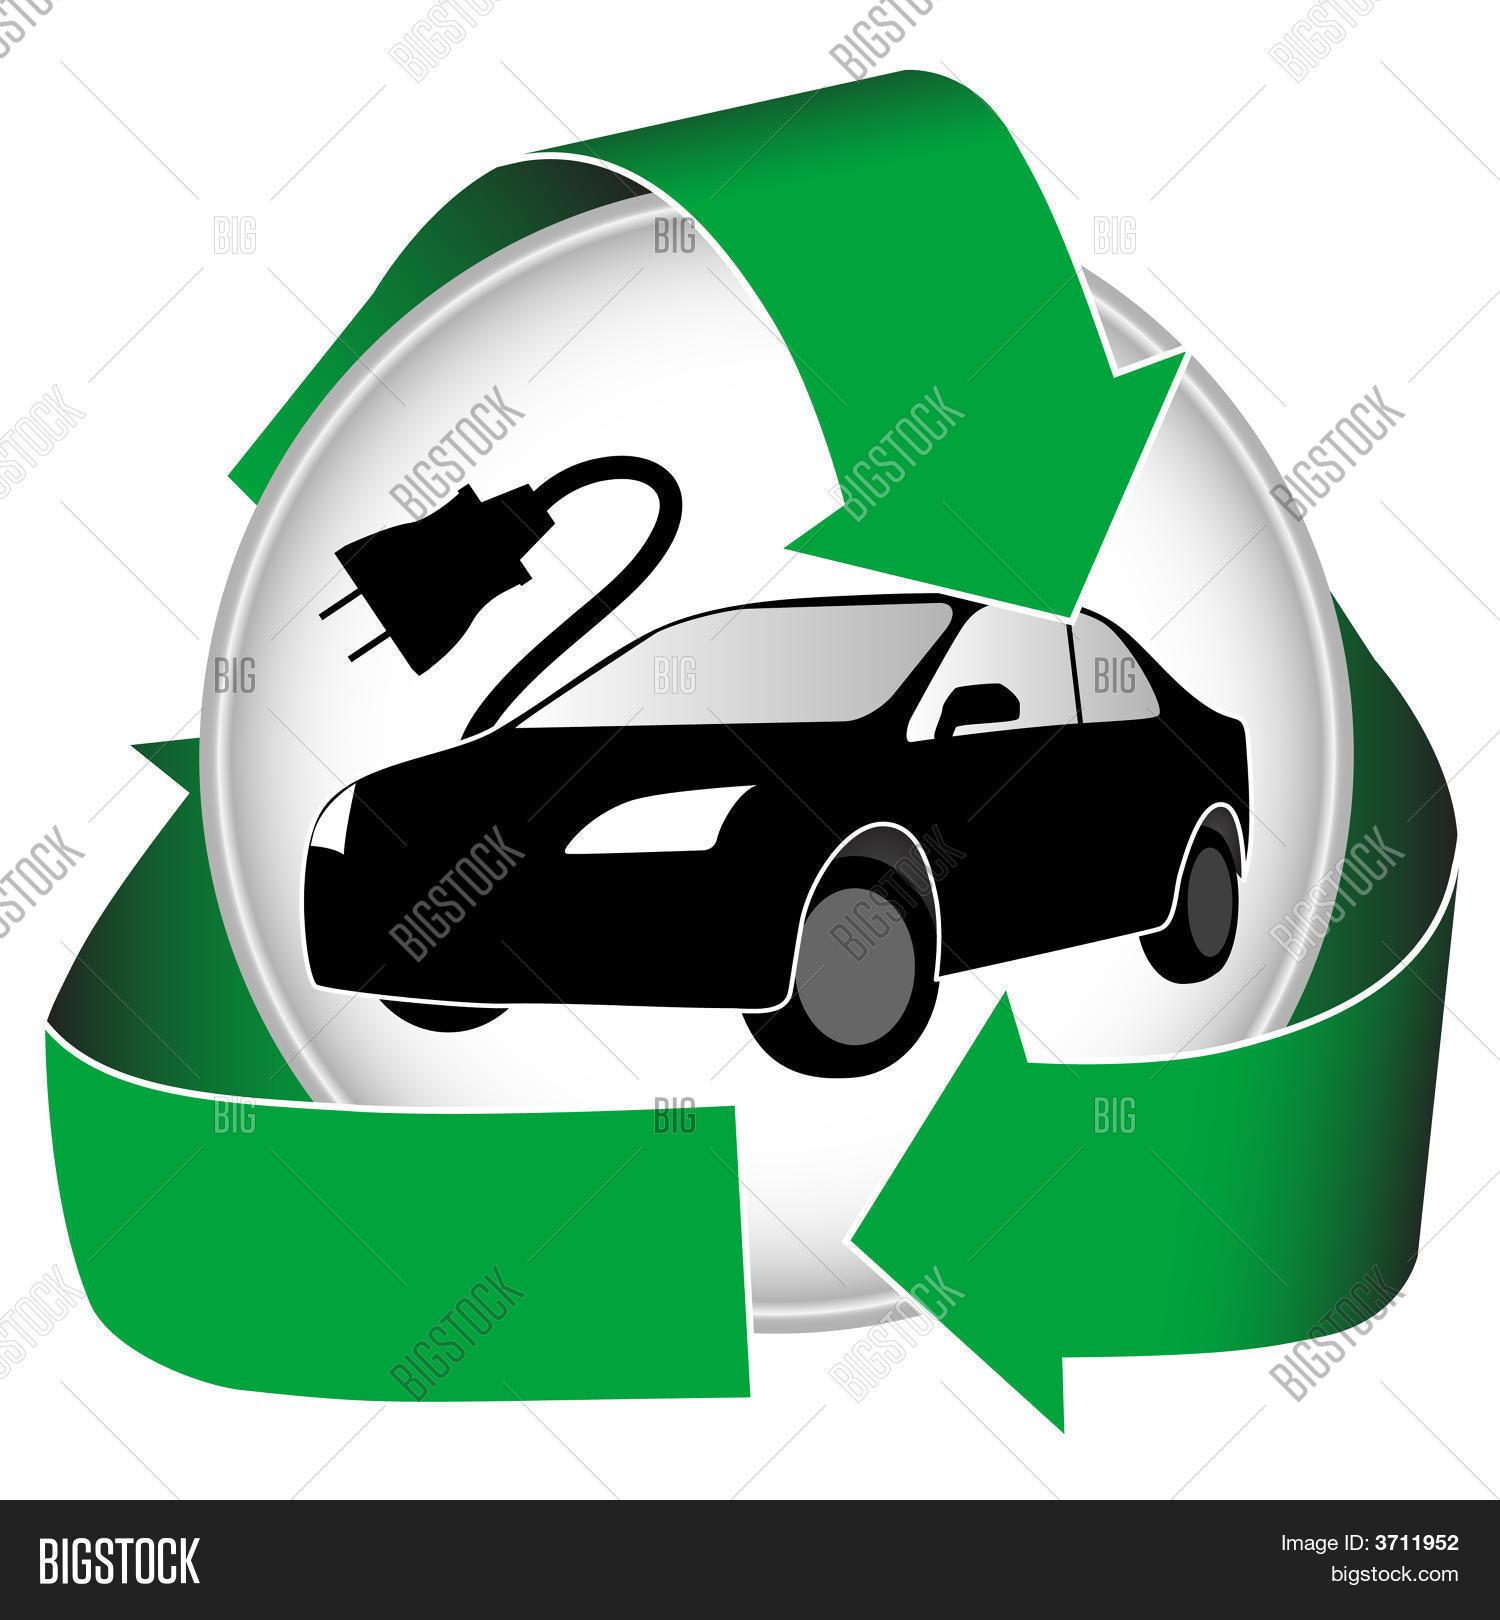 Electric Car Icon Image Photo Free Trial Bigstock